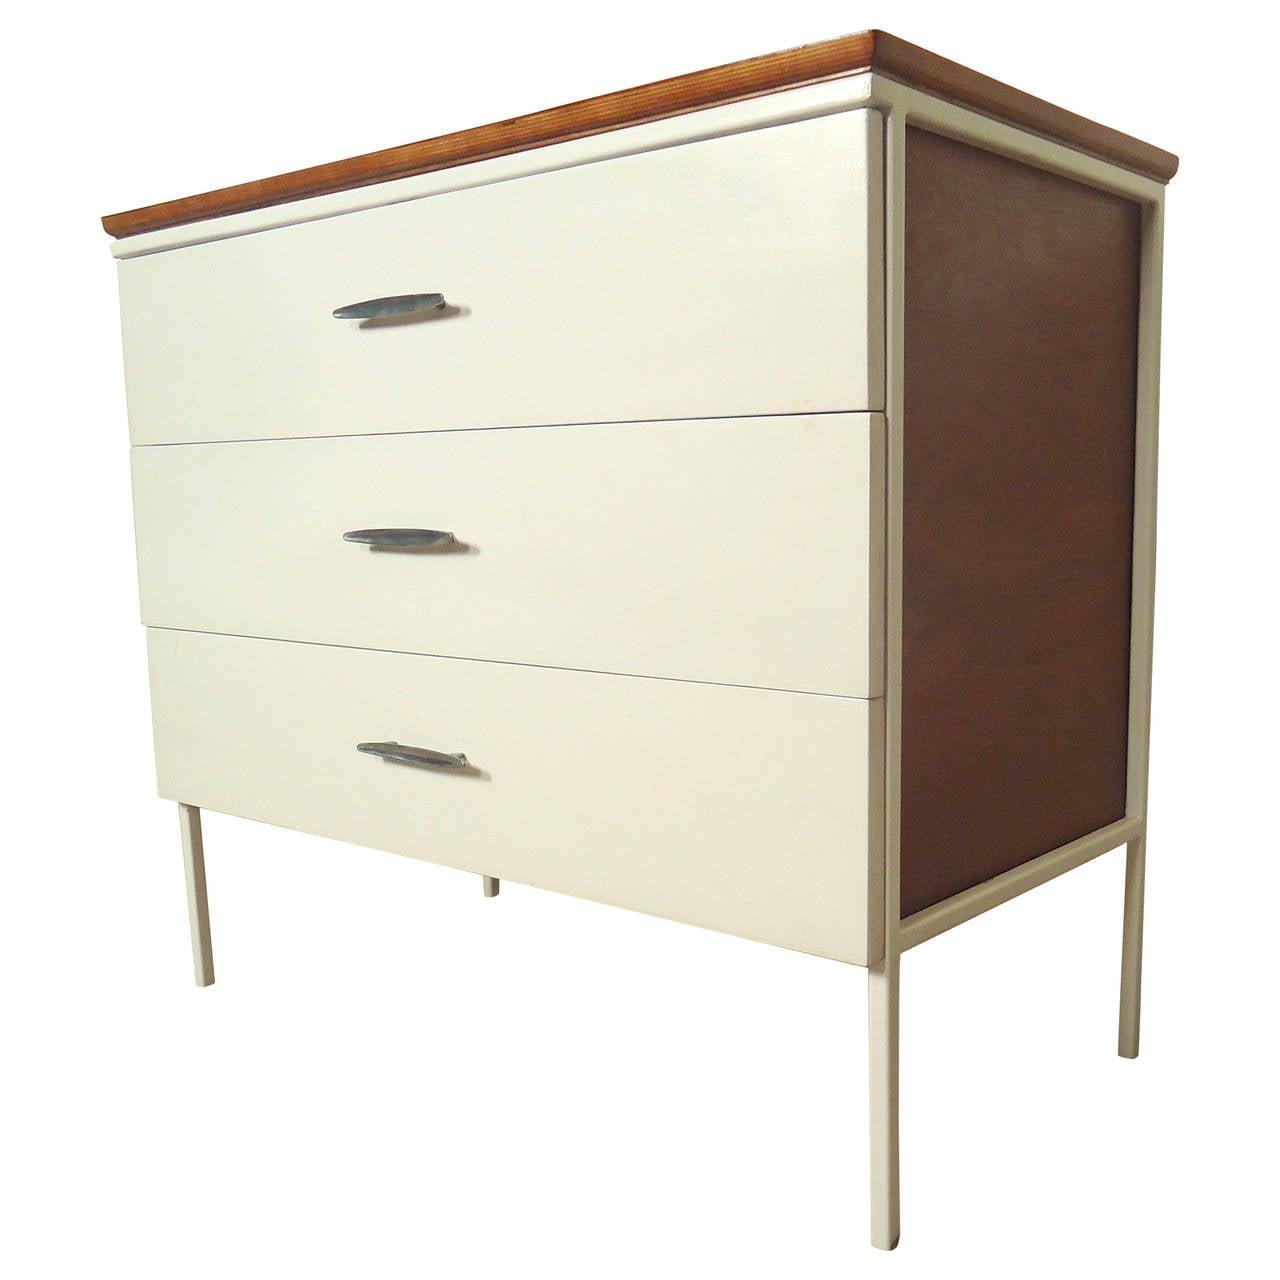 George Nelson Style Dresser by Vista Furniture